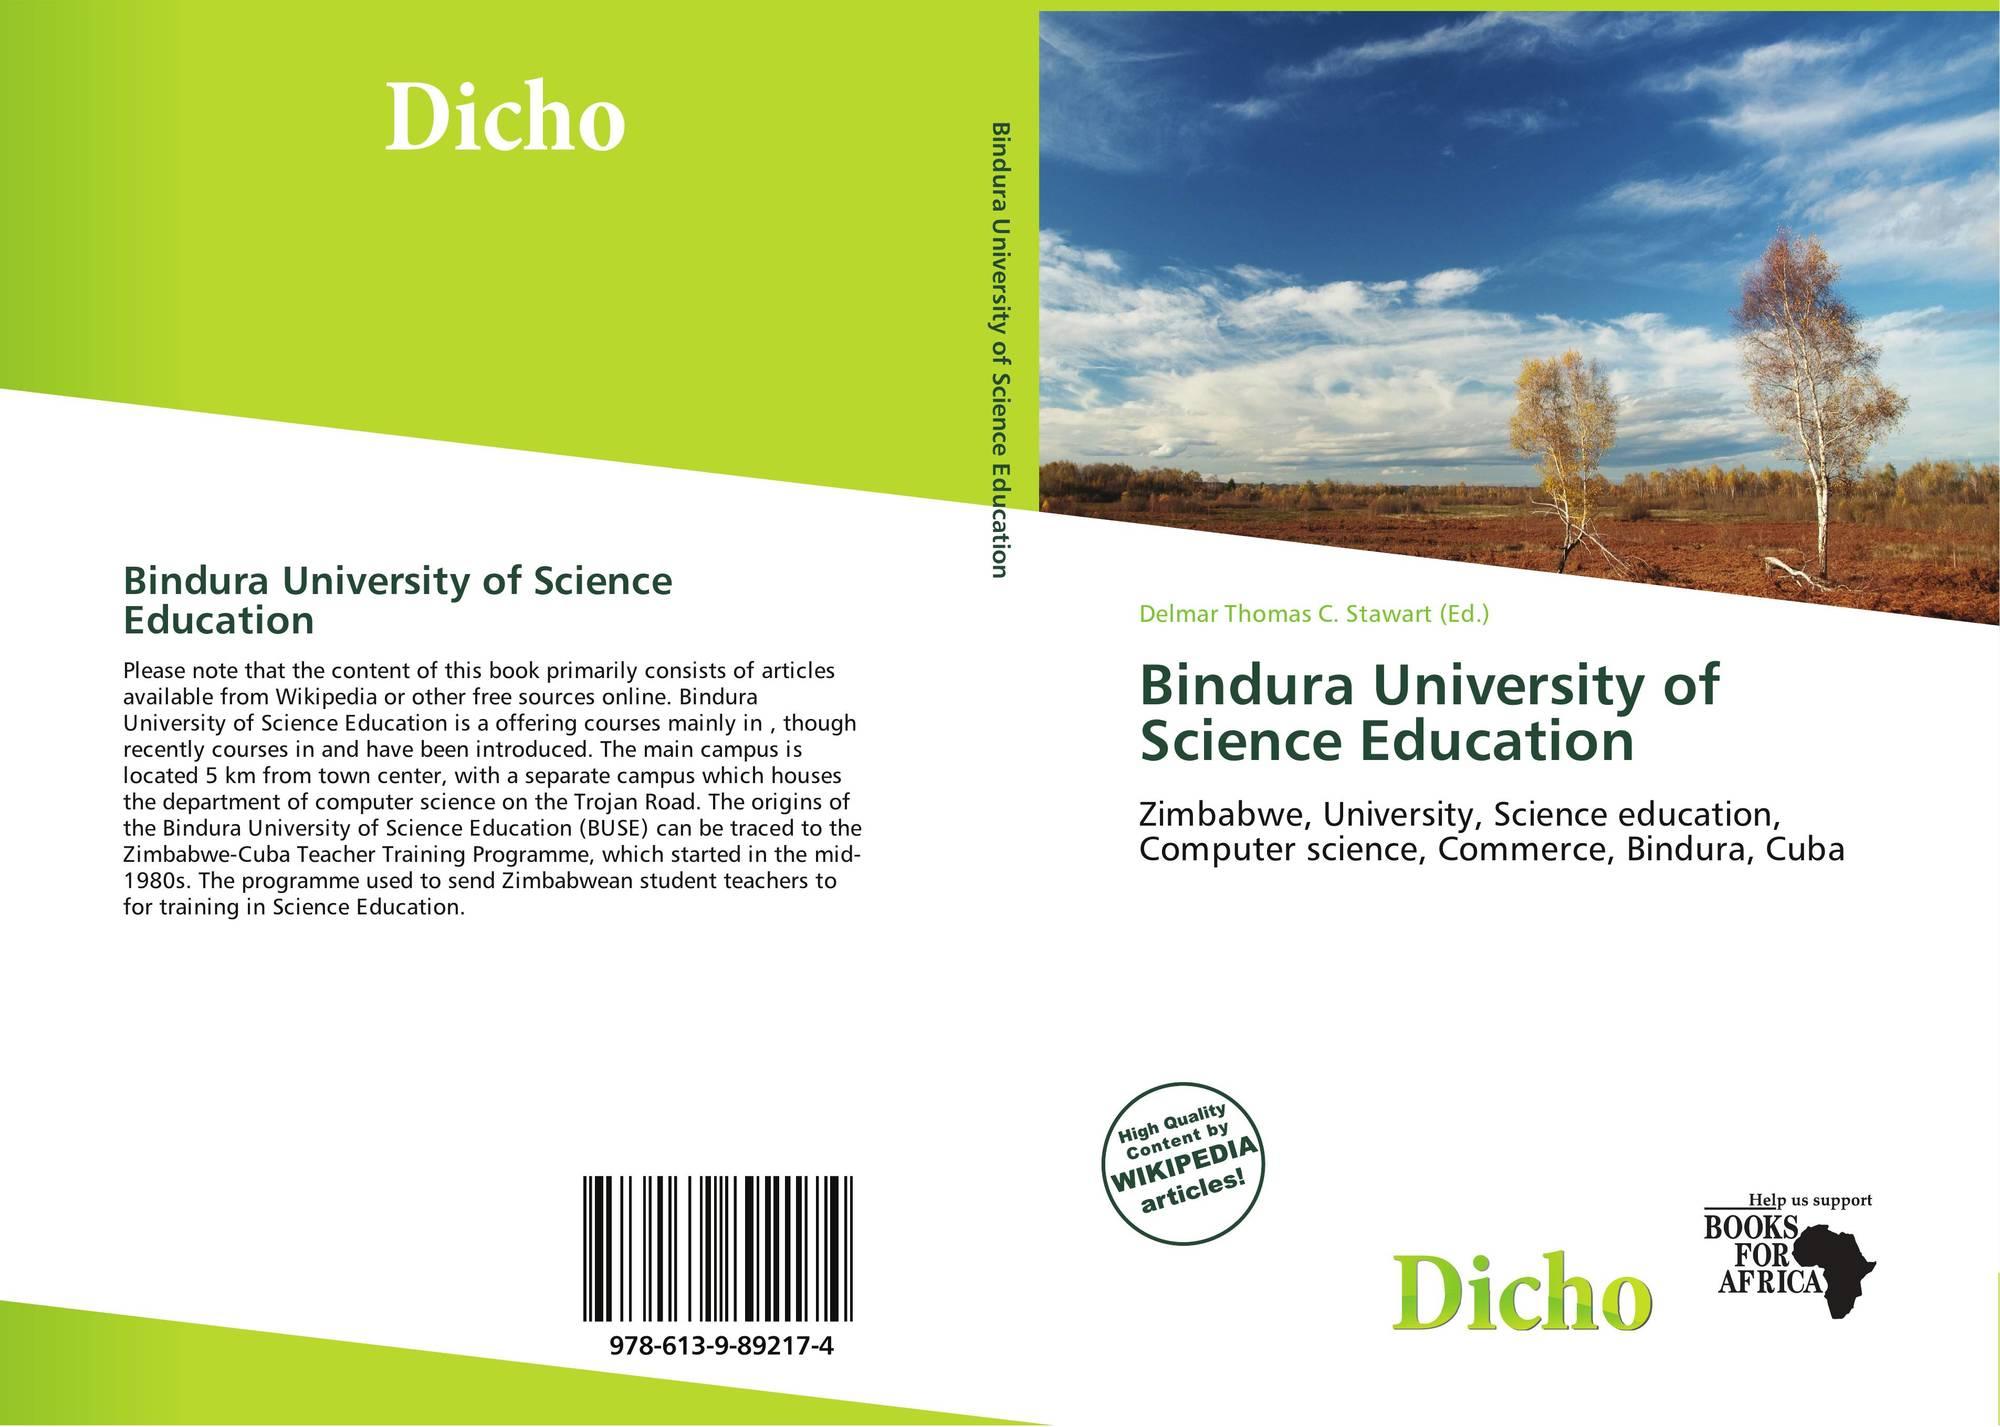 bindura university of science education Bindura university of science education, accountancy, alumnus download curriculum vitae for nelson maseko (last updated august 2014) brief.